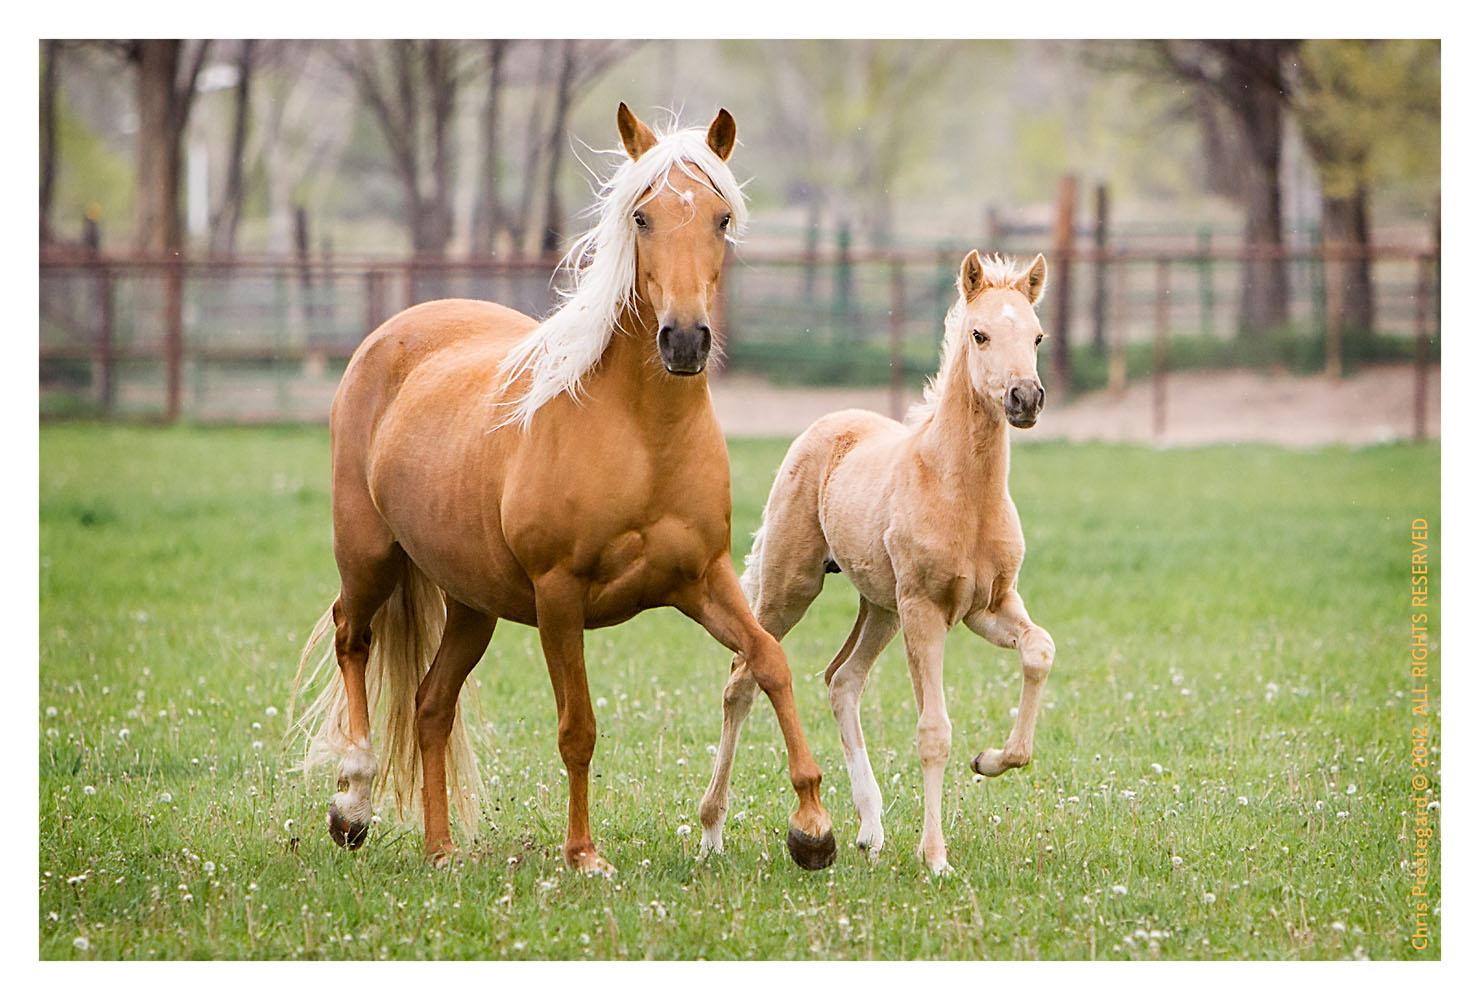 Horse1609-Feb11-2012